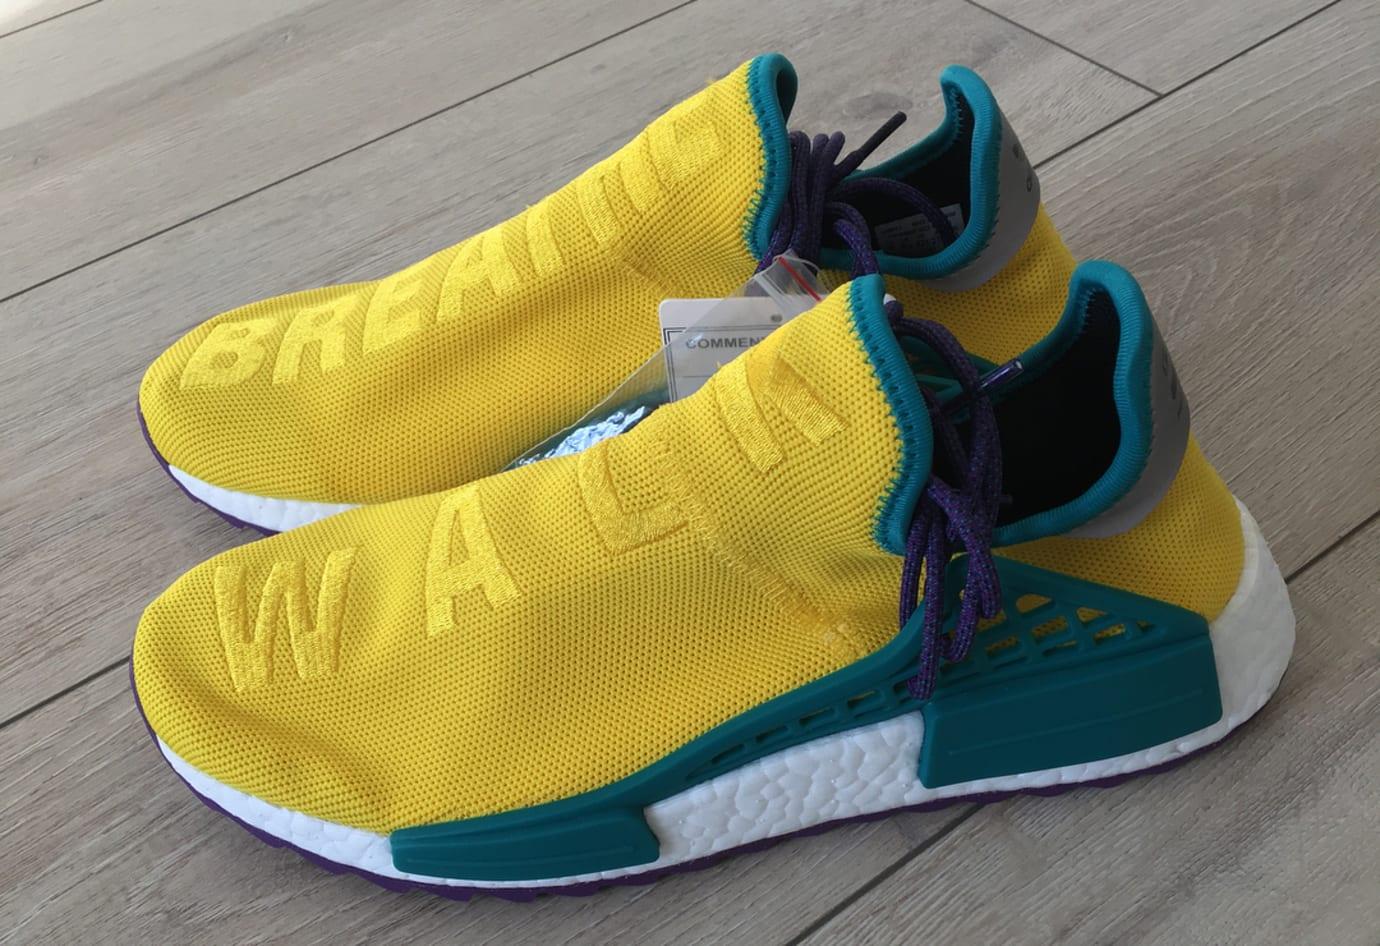 Pharrell x Adidas NMD Hu Breathe Walk Yellow Green Purple Front